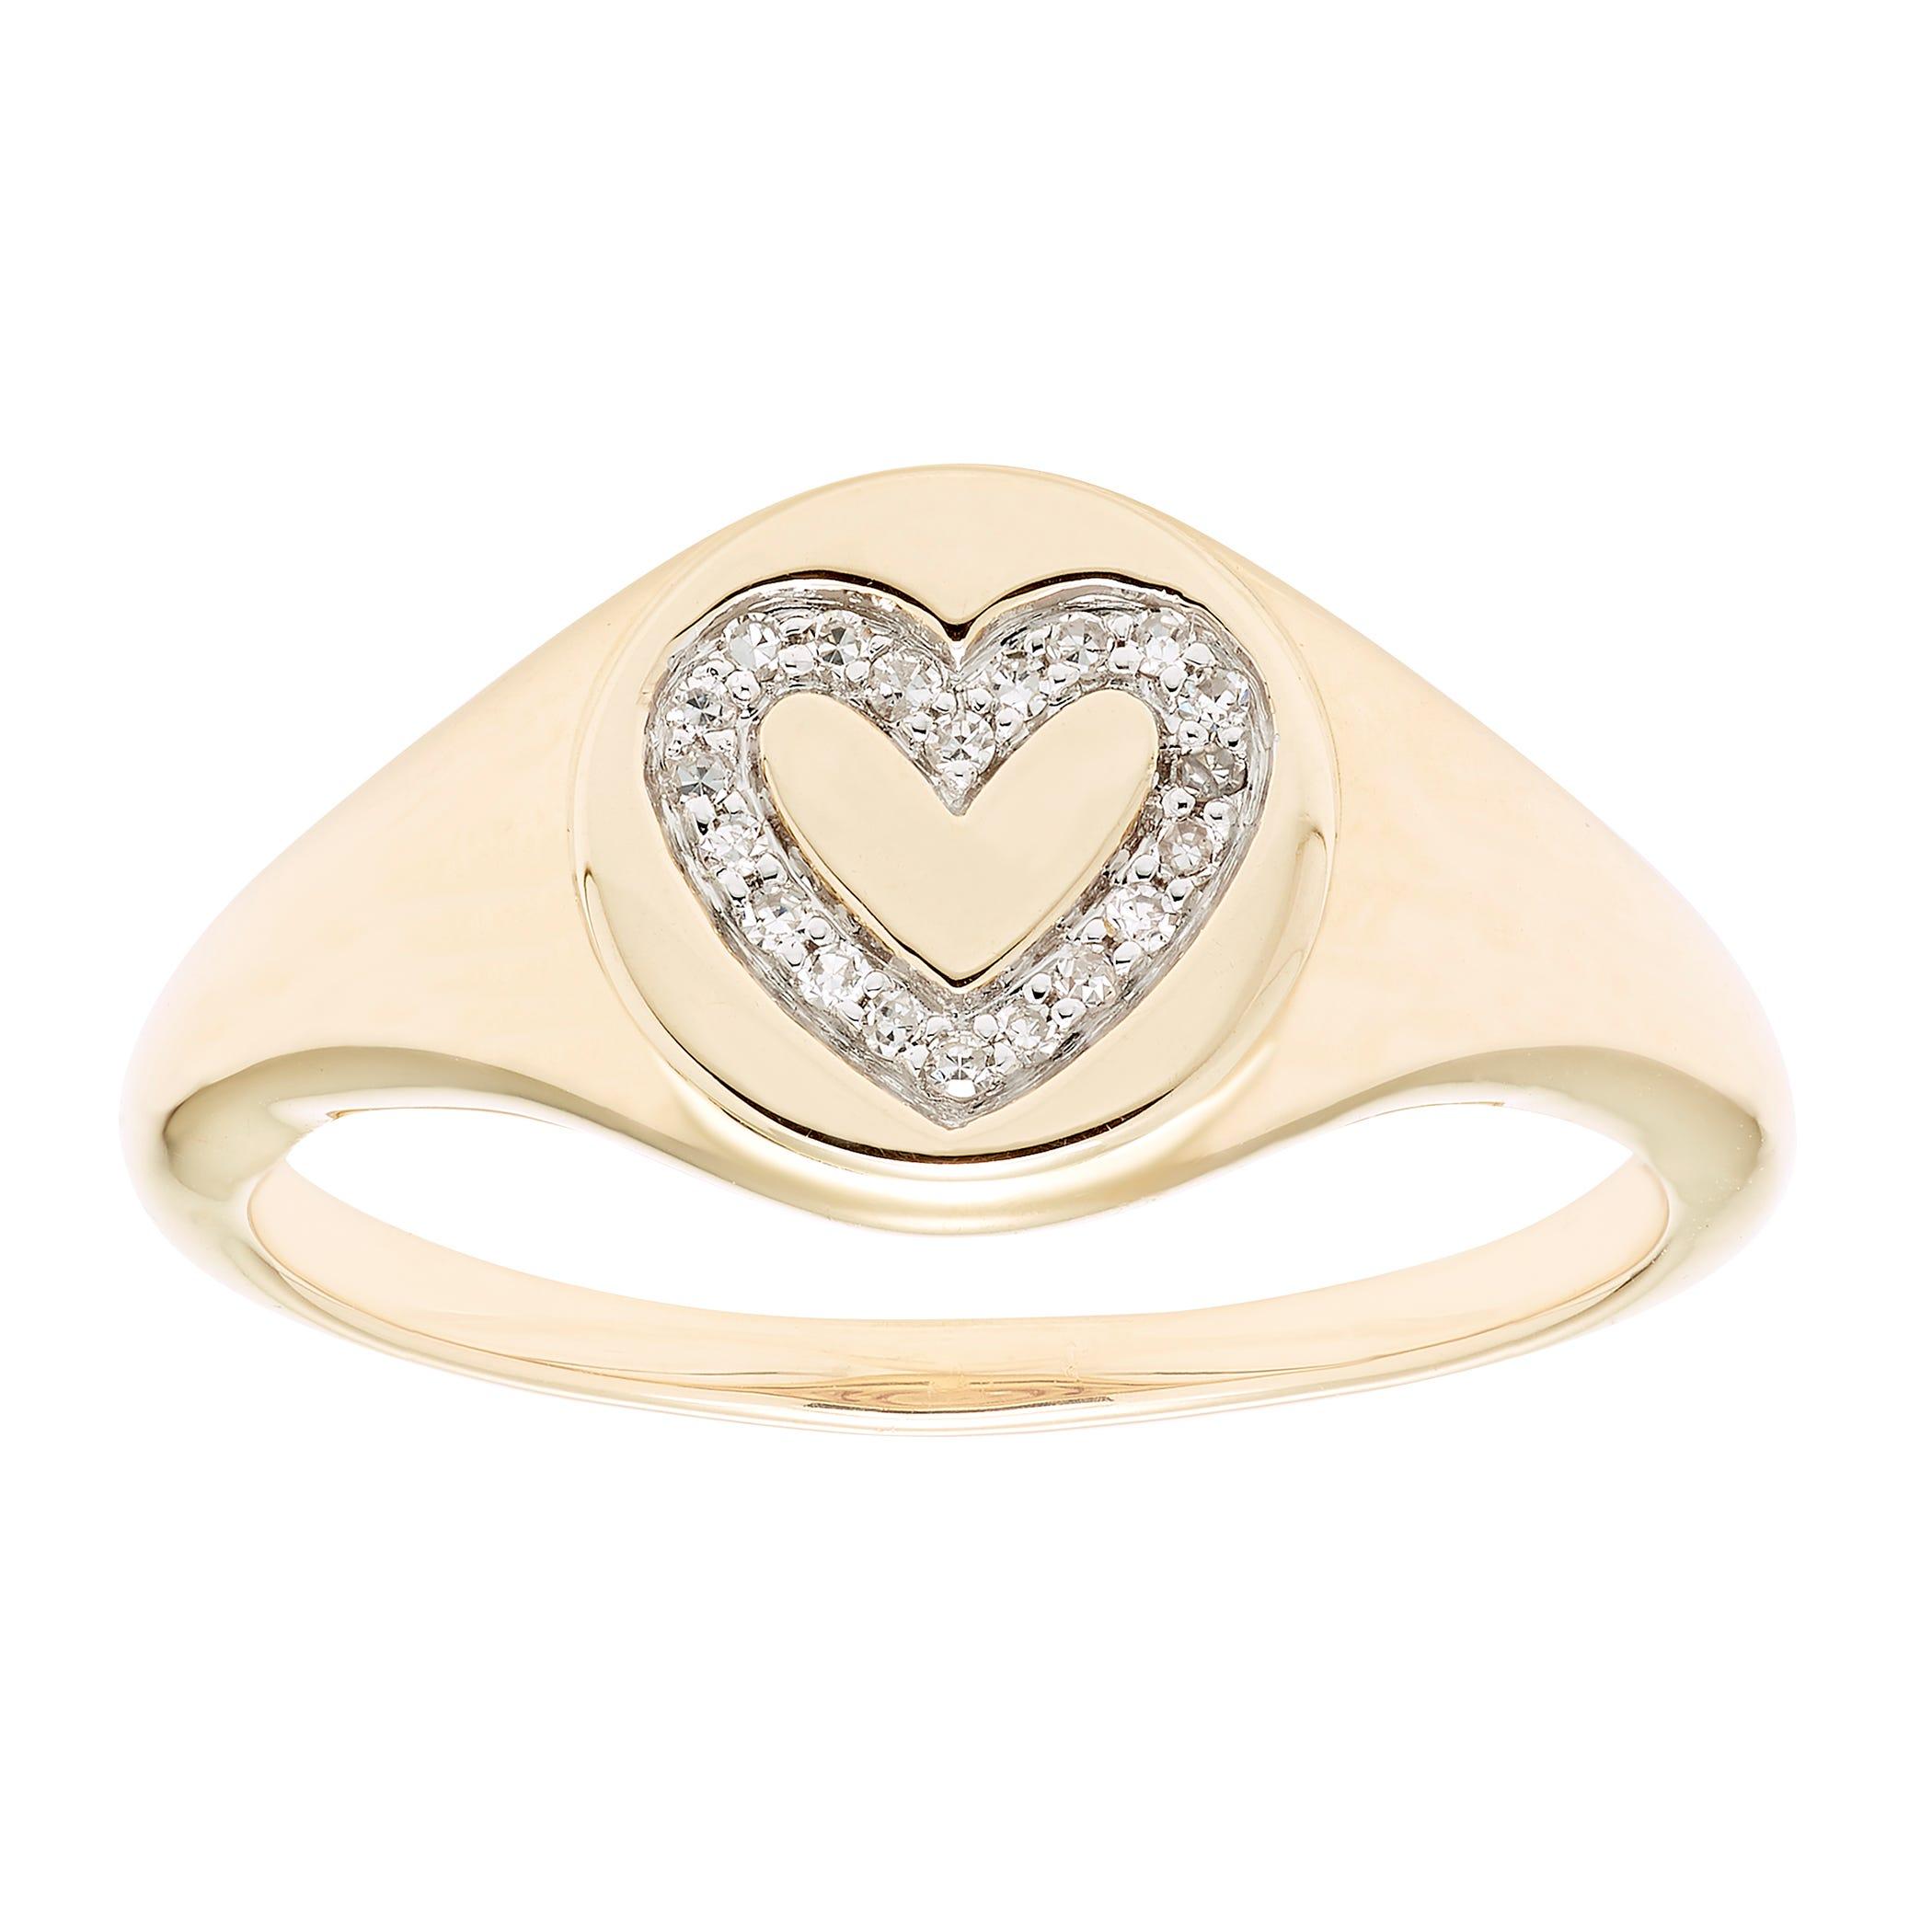 Diamond Heart Signet Ring in 14k Yellow Gold